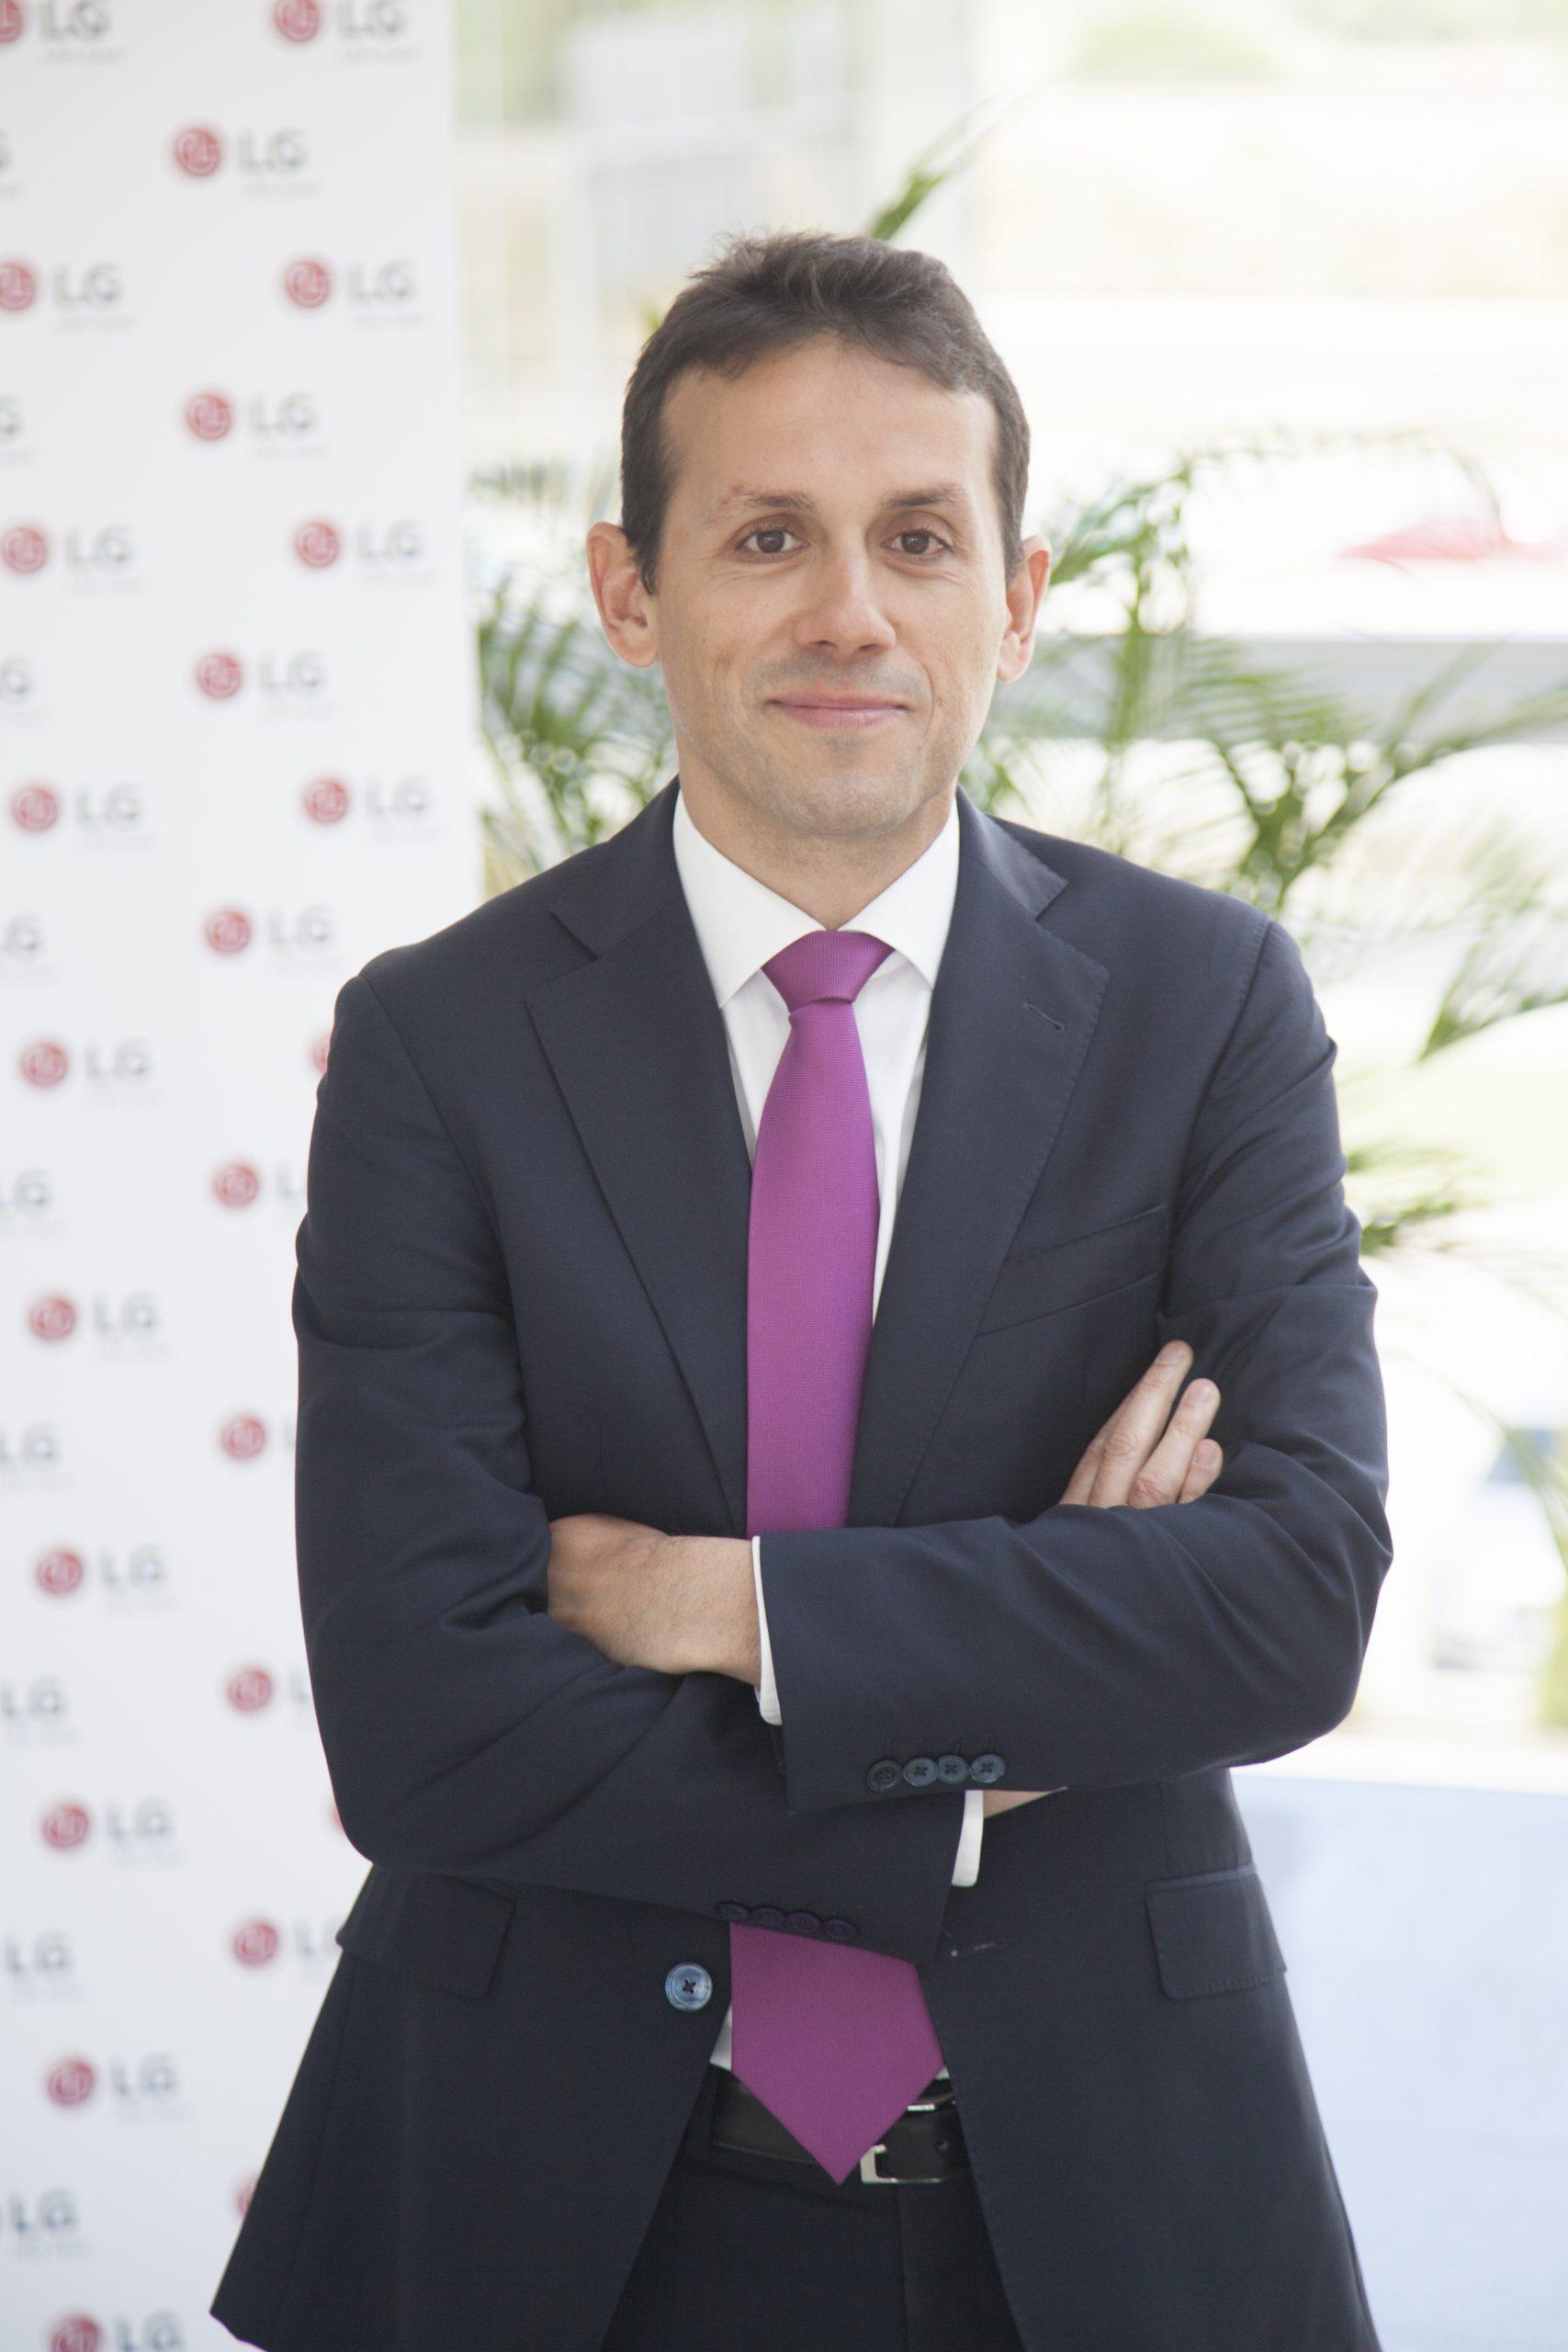 Óscar Cabo, Director General Comercial de LG Electronics